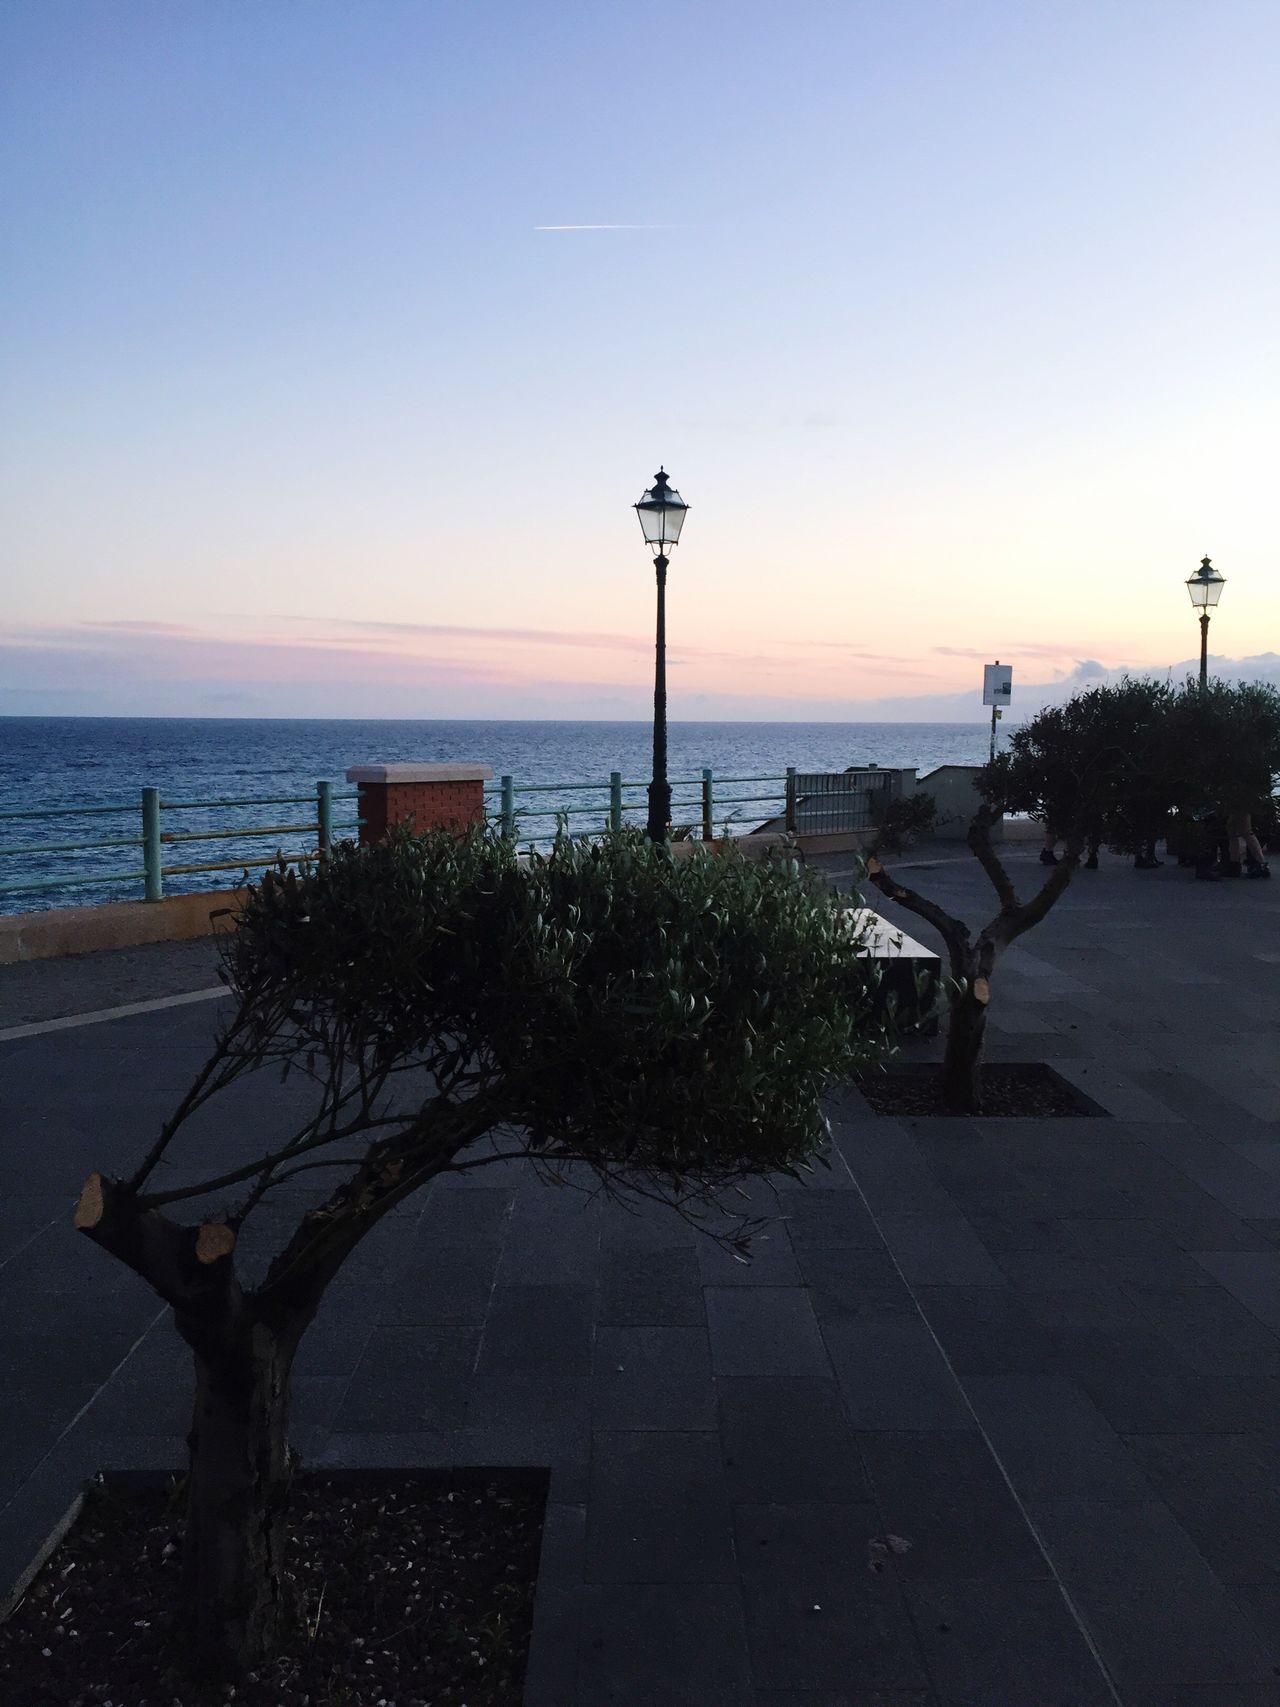 Tramonto Sea Evening Liguria,Italy Quarto April Showcase View